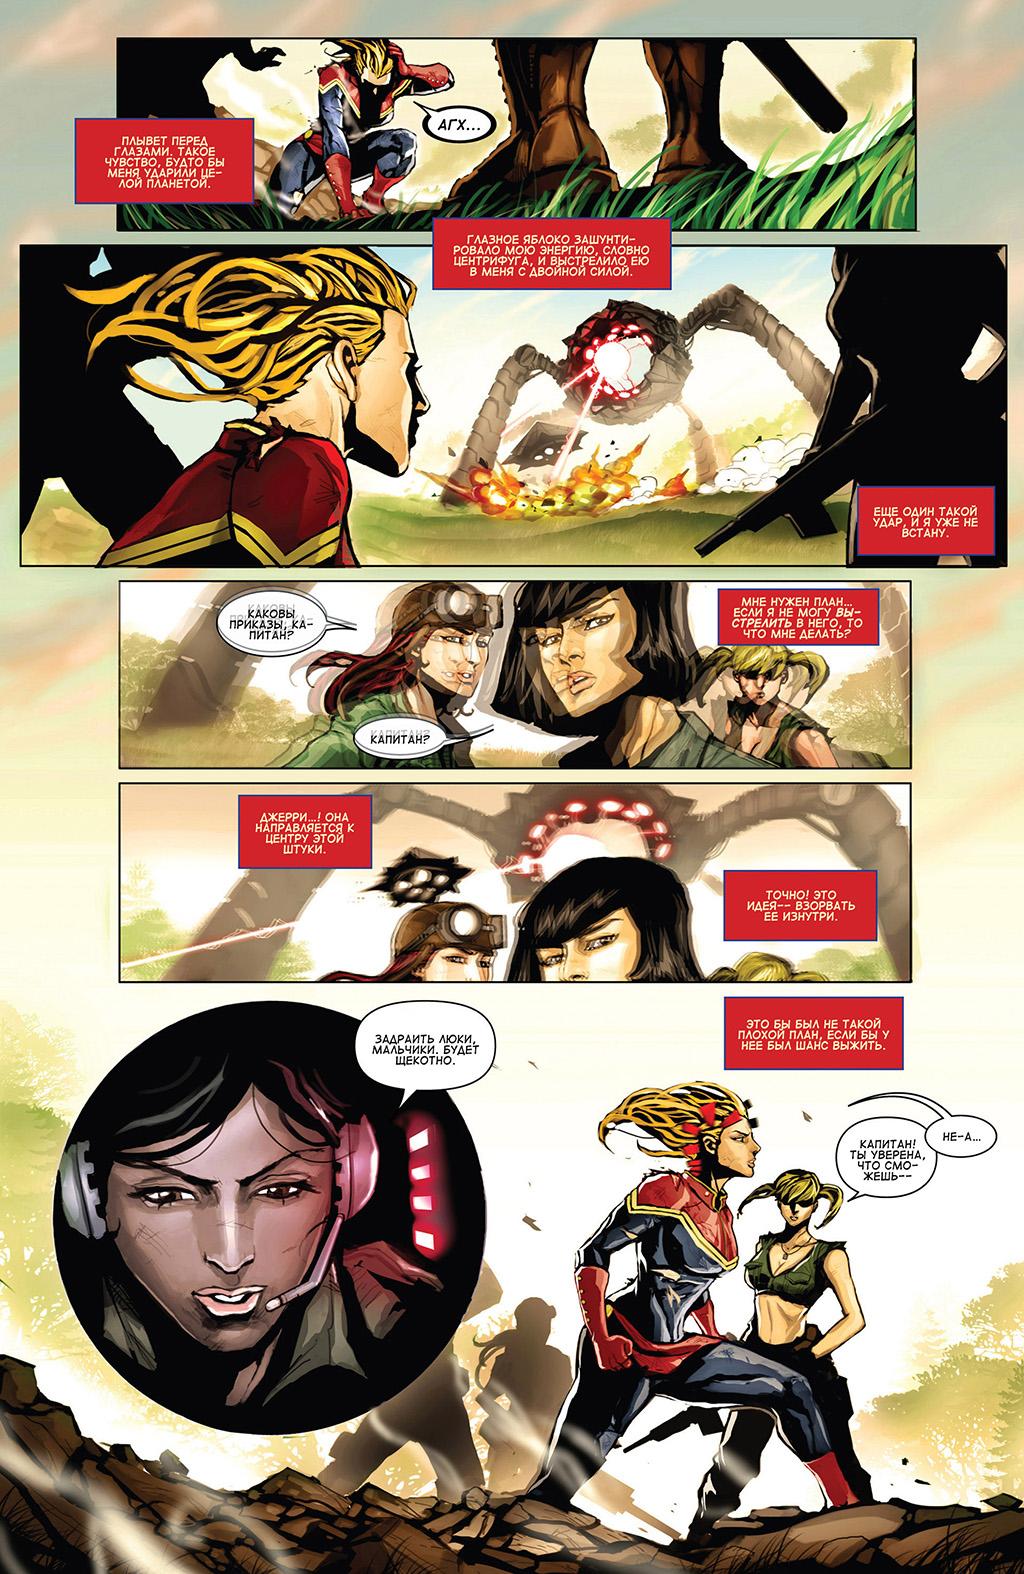 Комиксы и Манга Онлайн на русском языке  Comics and Manga